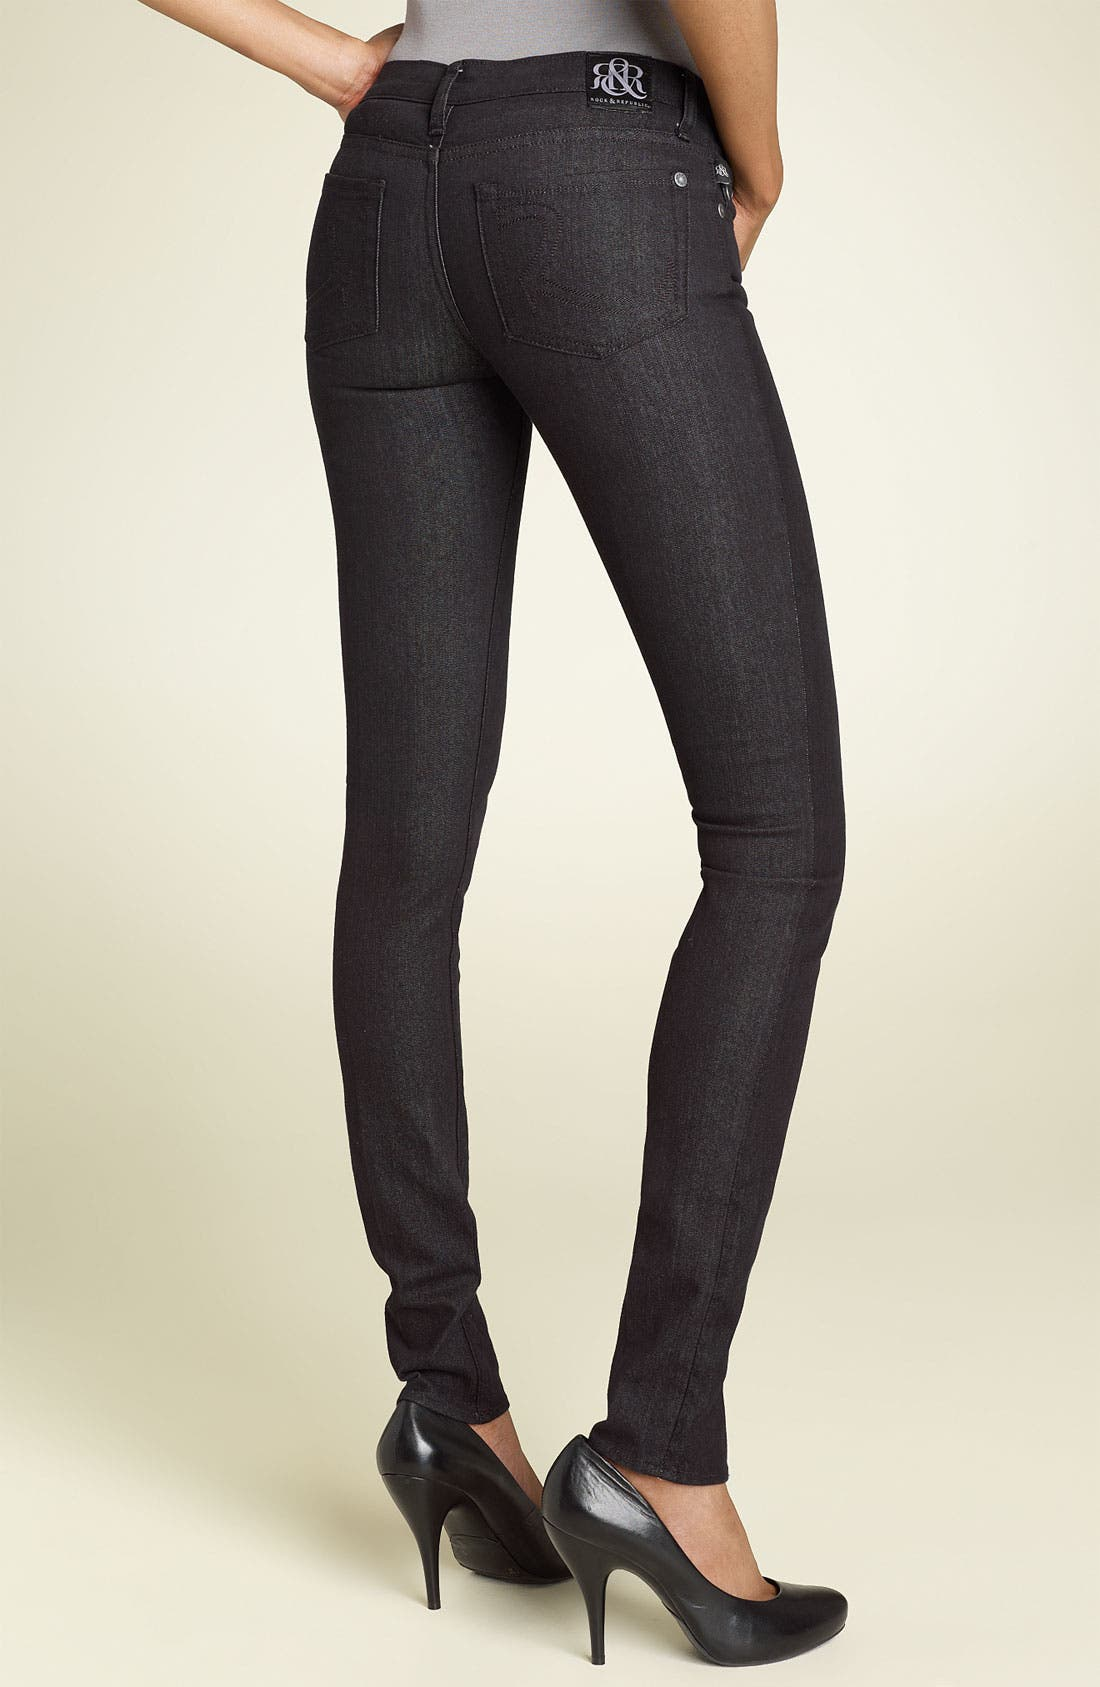 Main Image - Rock & Republic 'Berlin' Skinny Stretch Jeans (Black Wash)